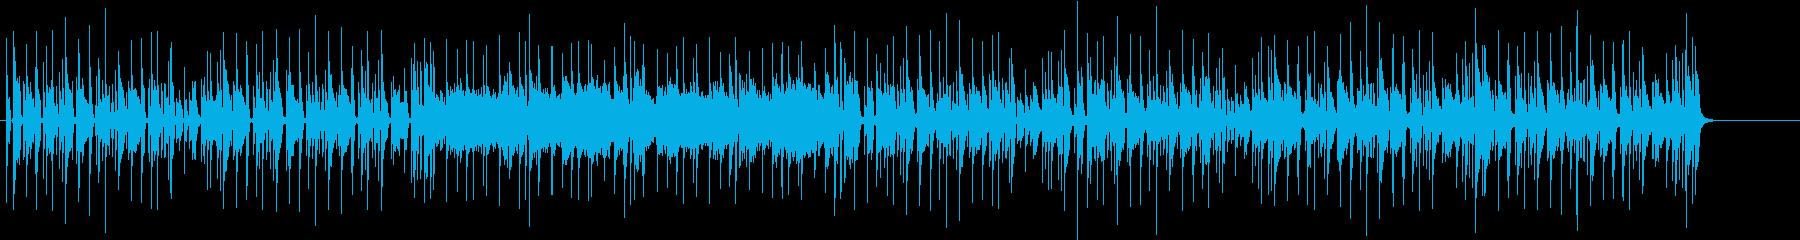 funkyな楽曲の再生済みの波形